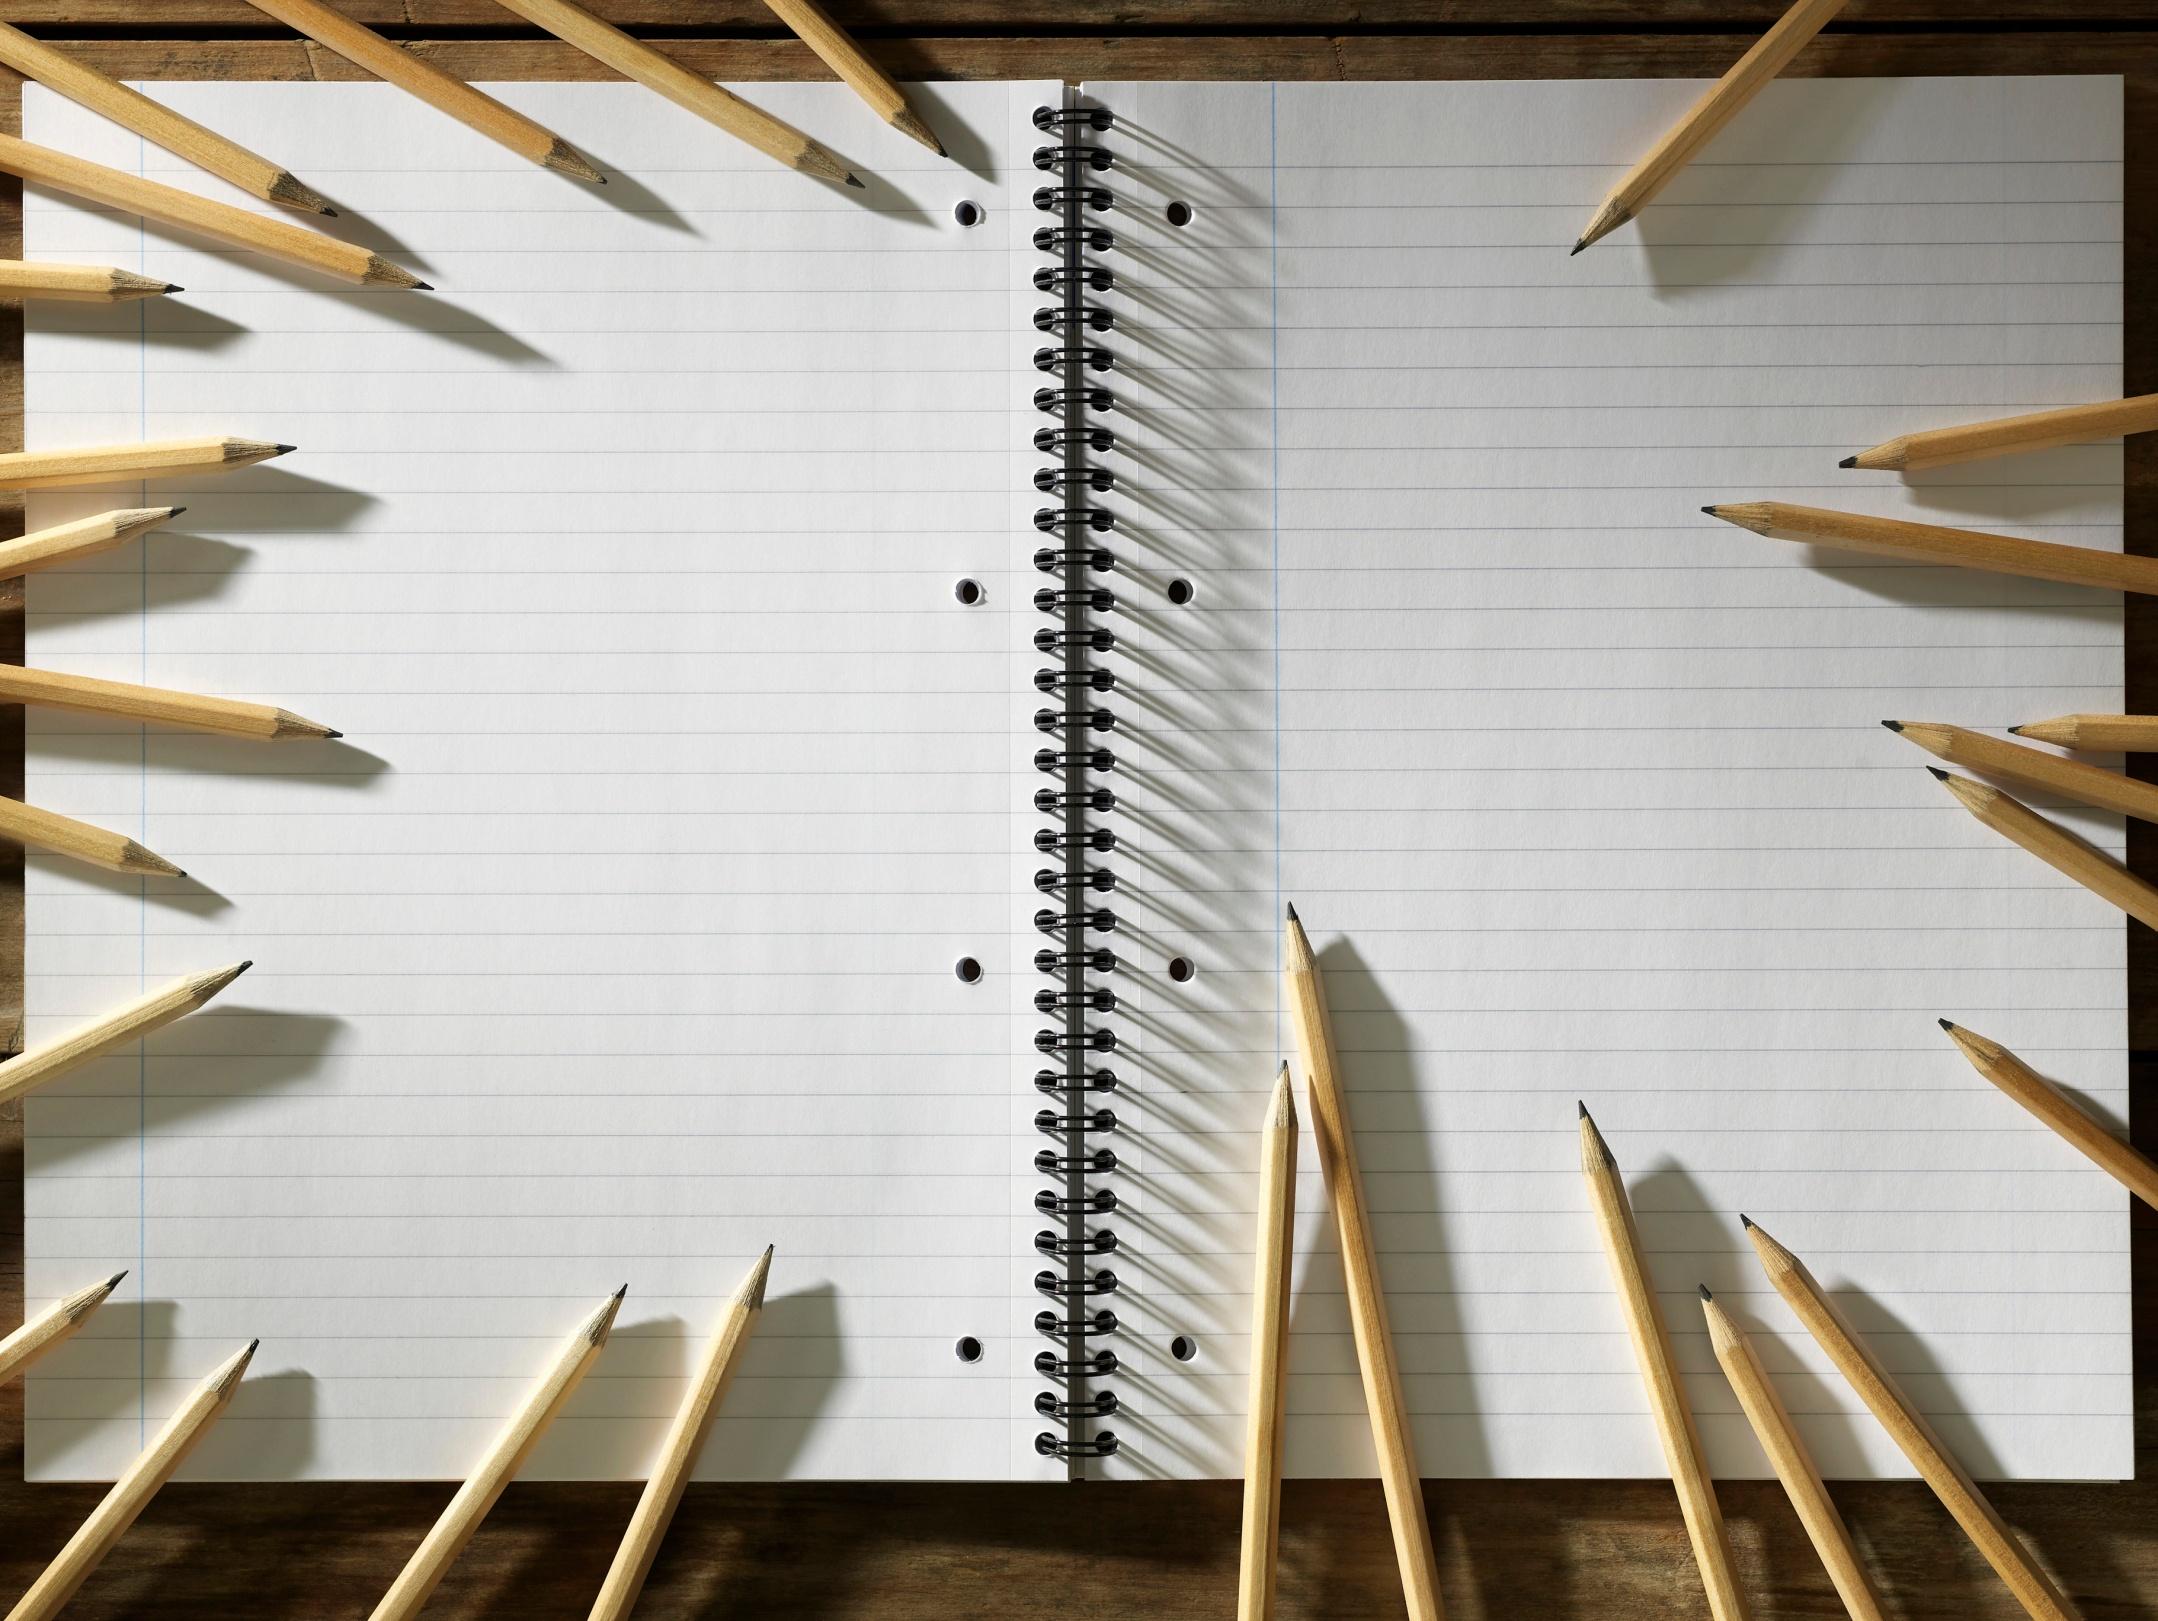 7 trucos de inspiración para tener un lluvia de ideas brillante